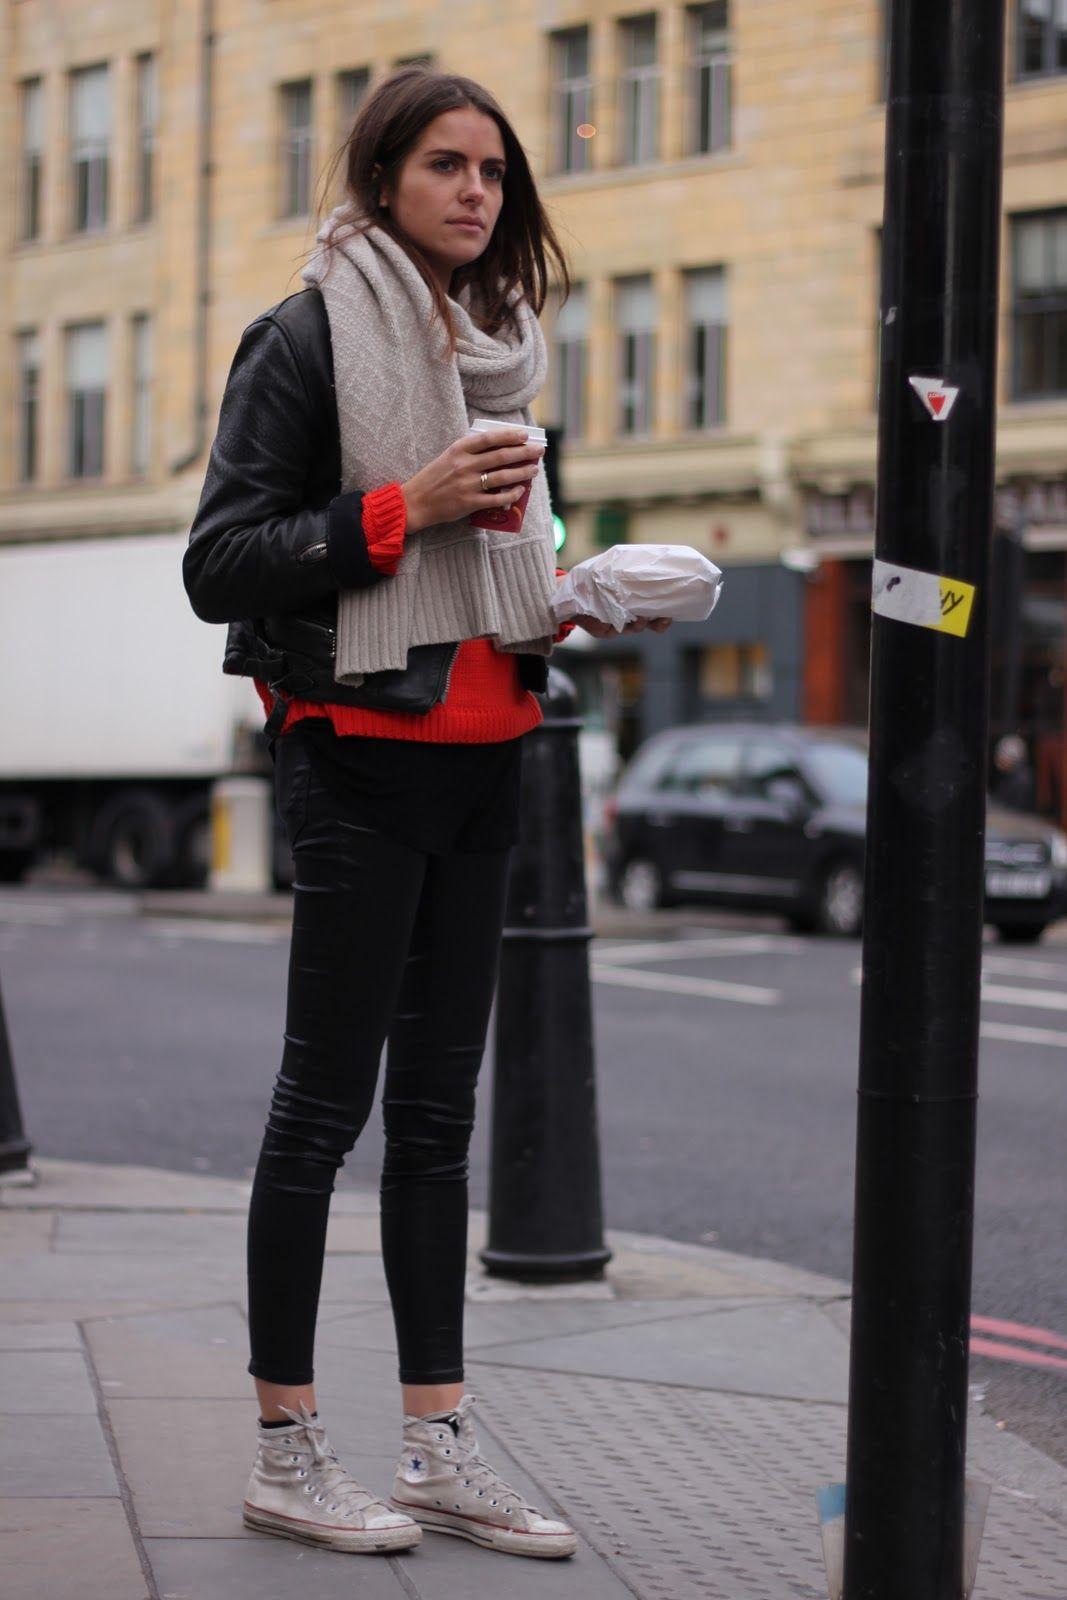 London In PaulSingles Chuck Townlondon Fashion By Taylor F1JlcK